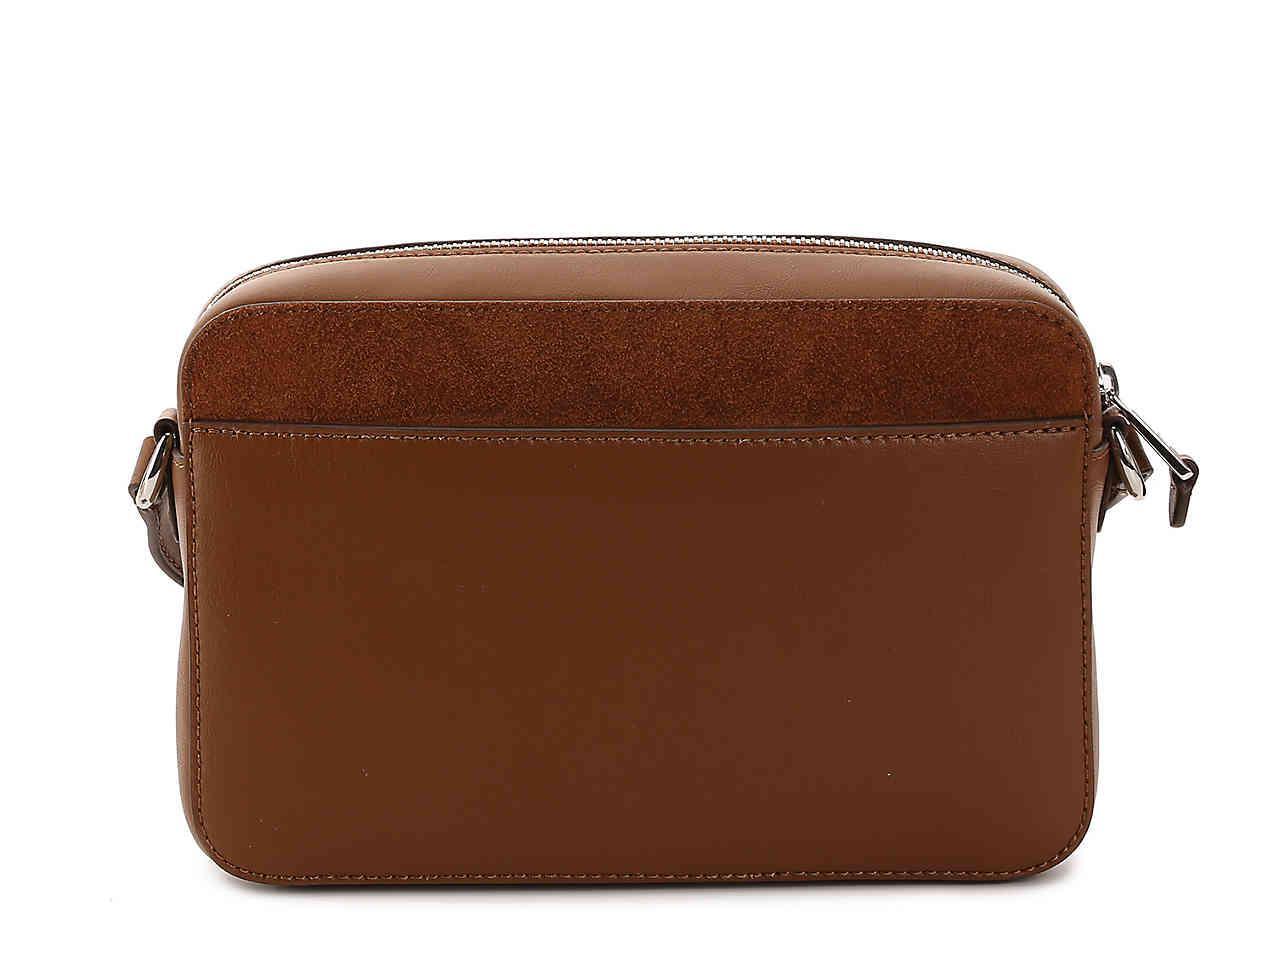 aae34e0780 Lyst - Lauren by Ralph Lauren Dowell Camera Leather Crossbody Bag in ...